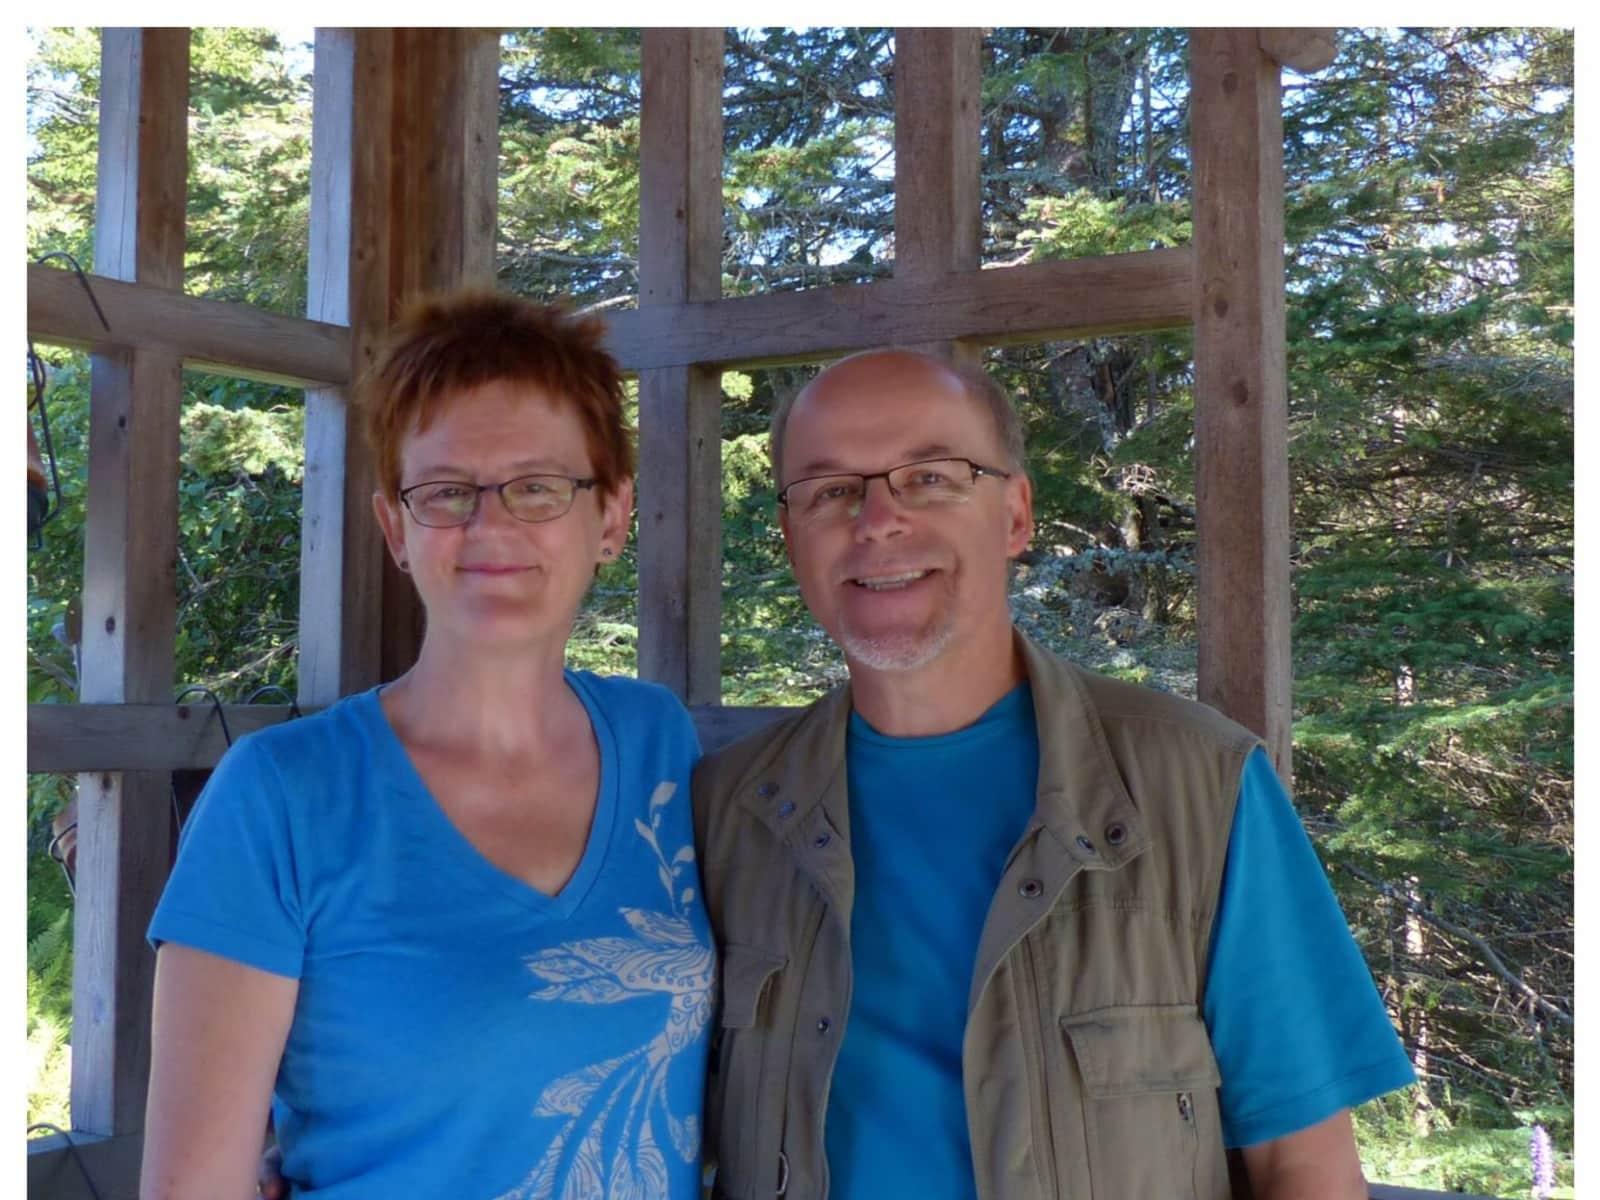 Danielle & Marcel from Montréal, Quebec, Canada